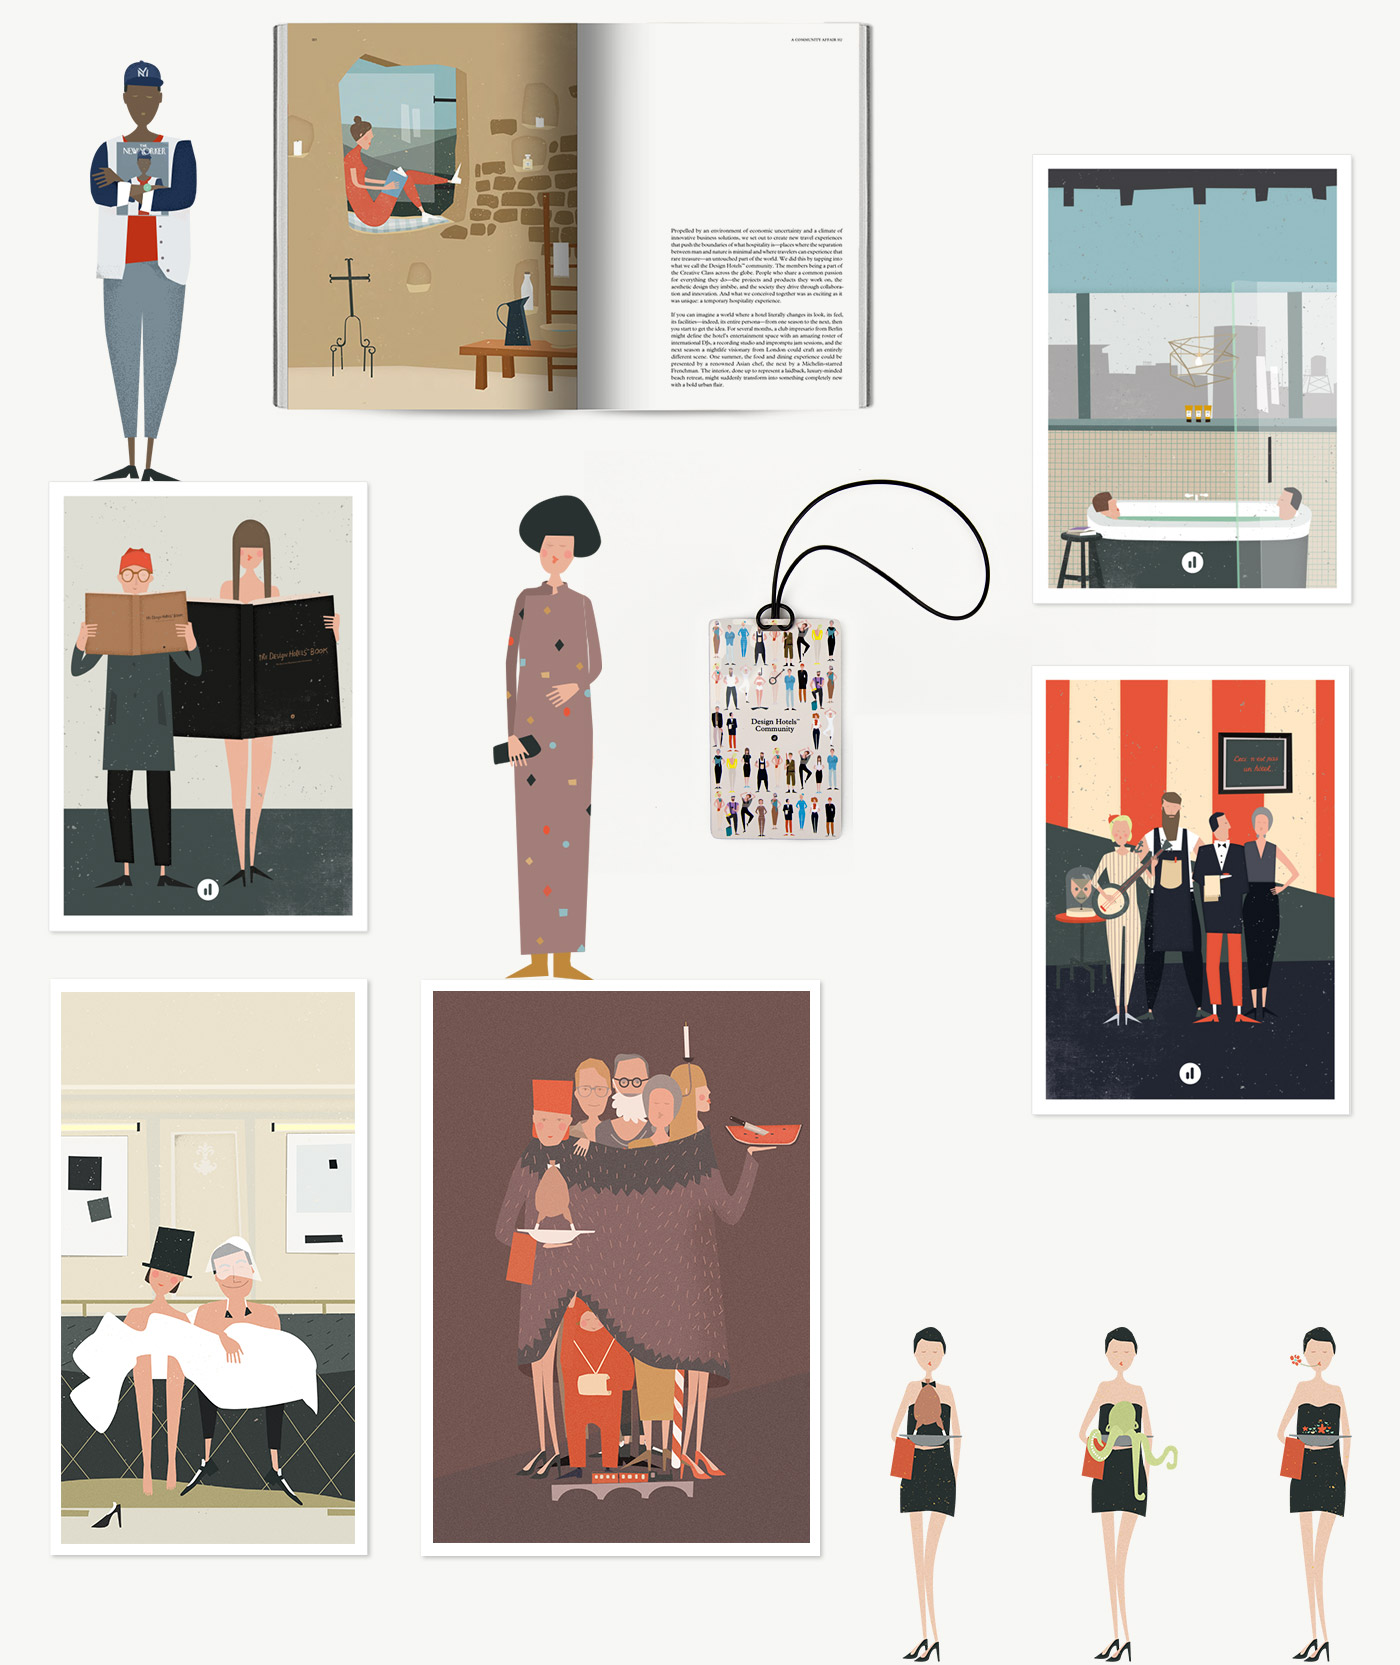 designhotels-community-illus-part1